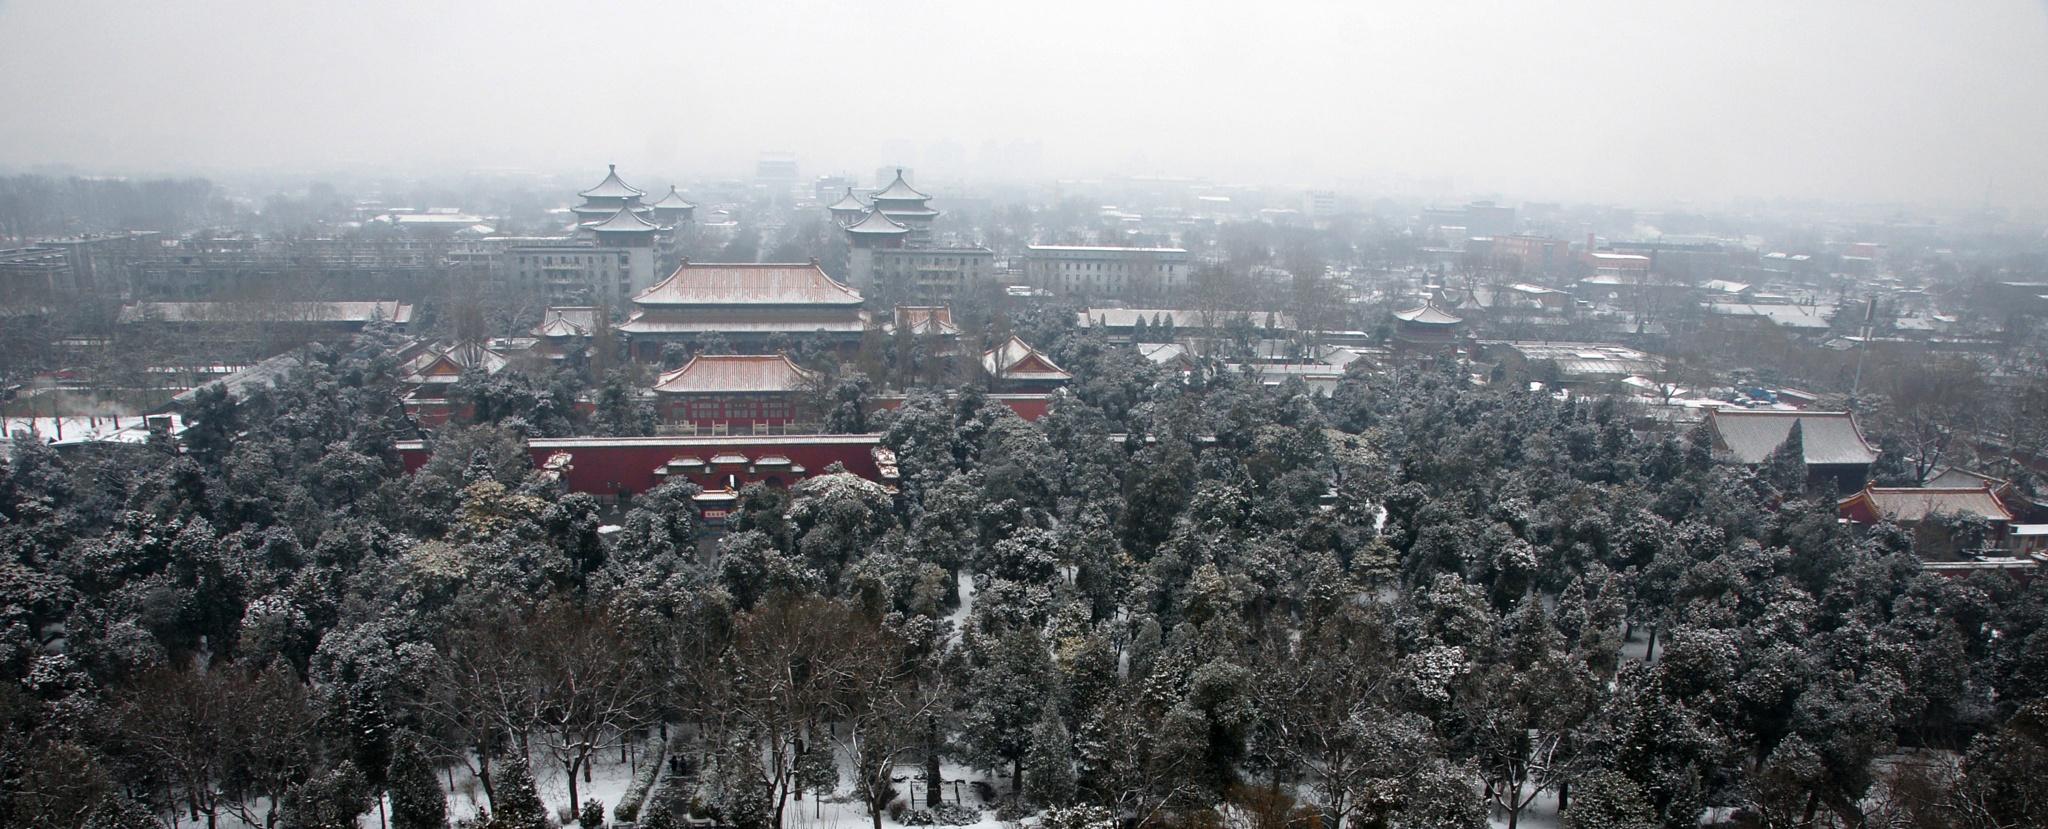 Forbidden City in winter by Marko Erman